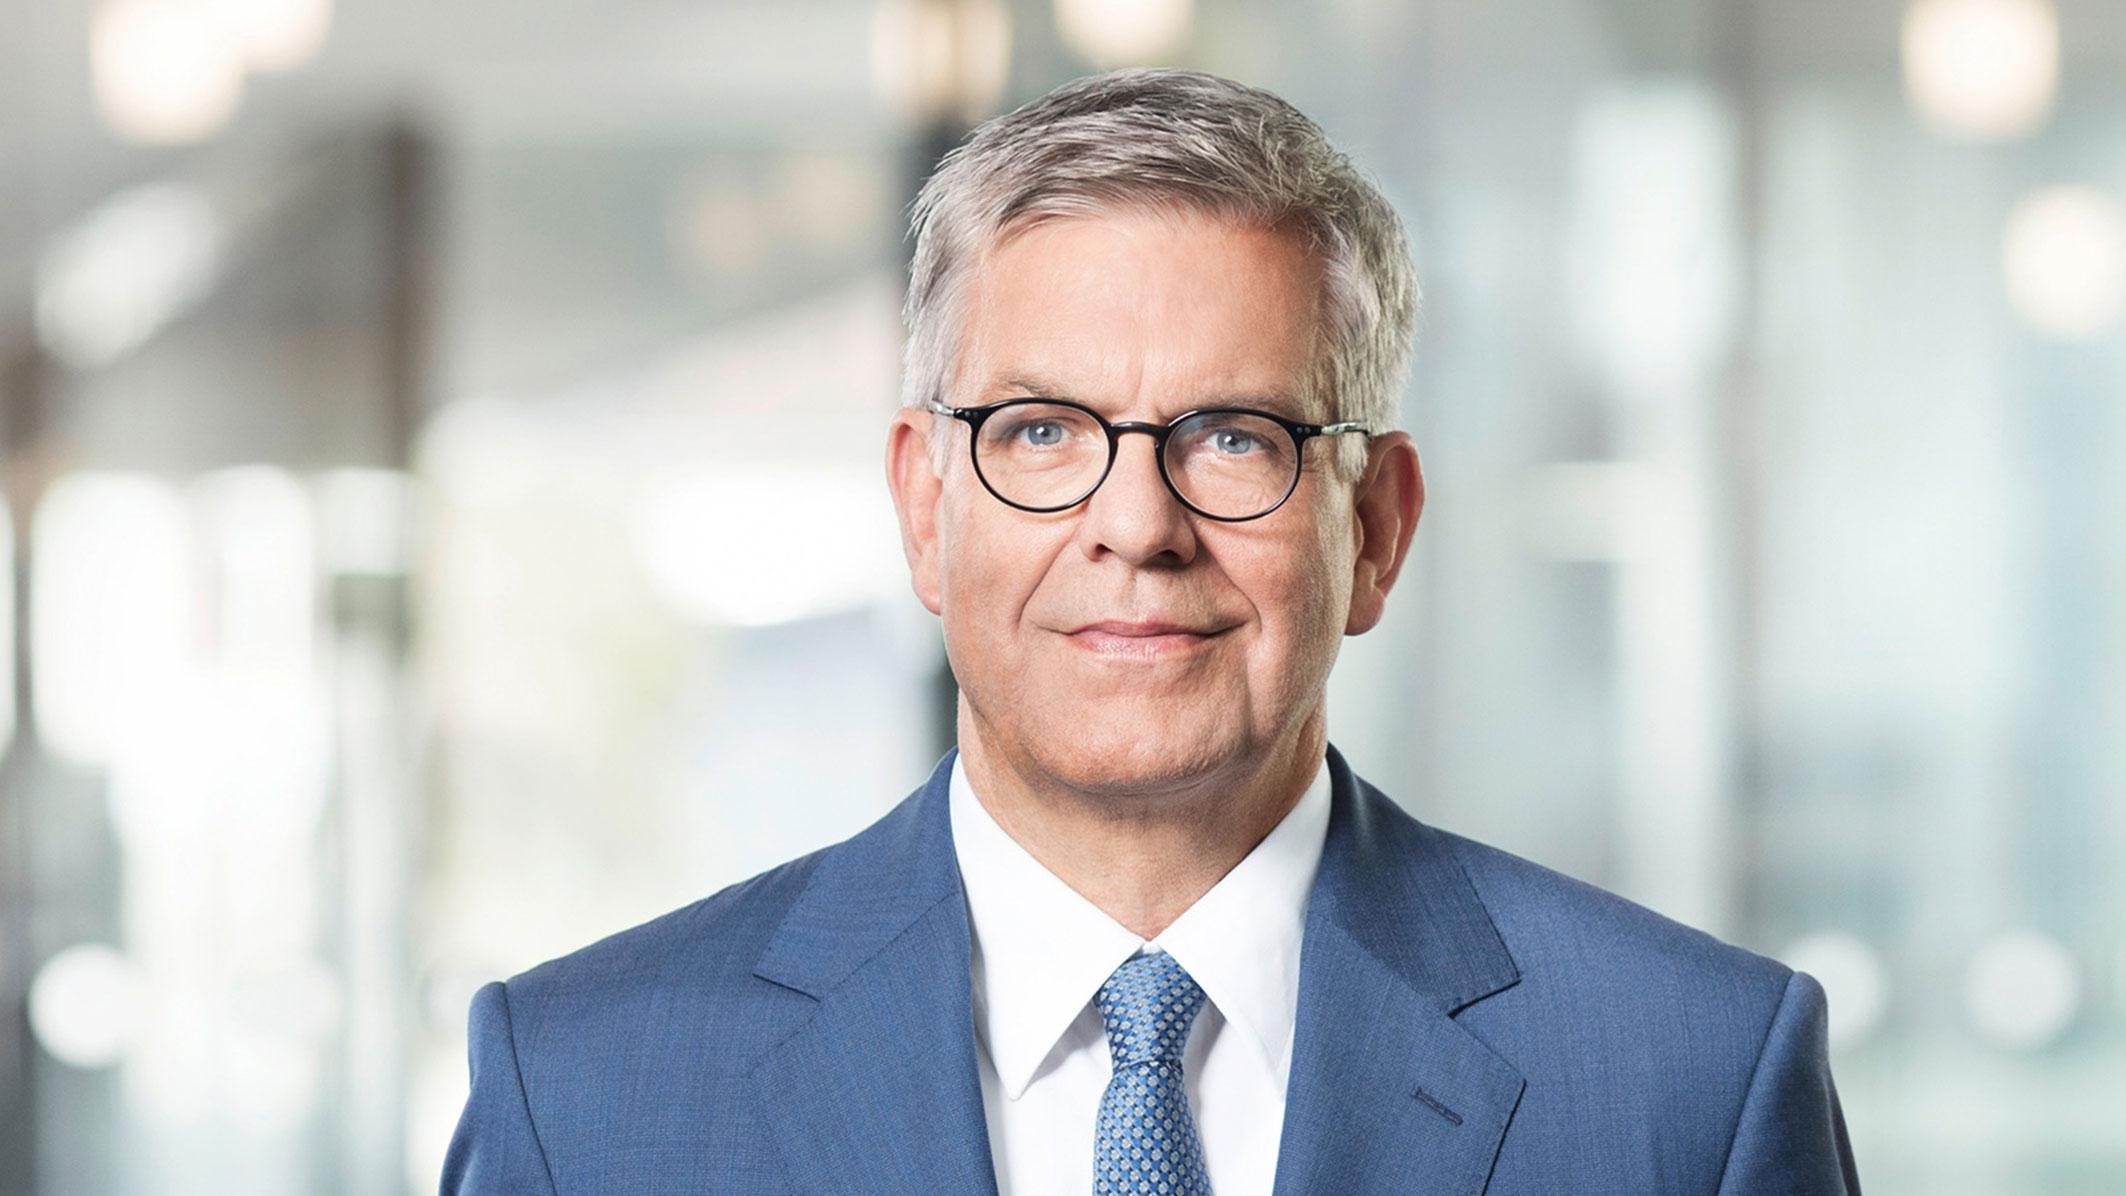 Dr. Thomas Bellut (ZDF/ Markus Hintzen)